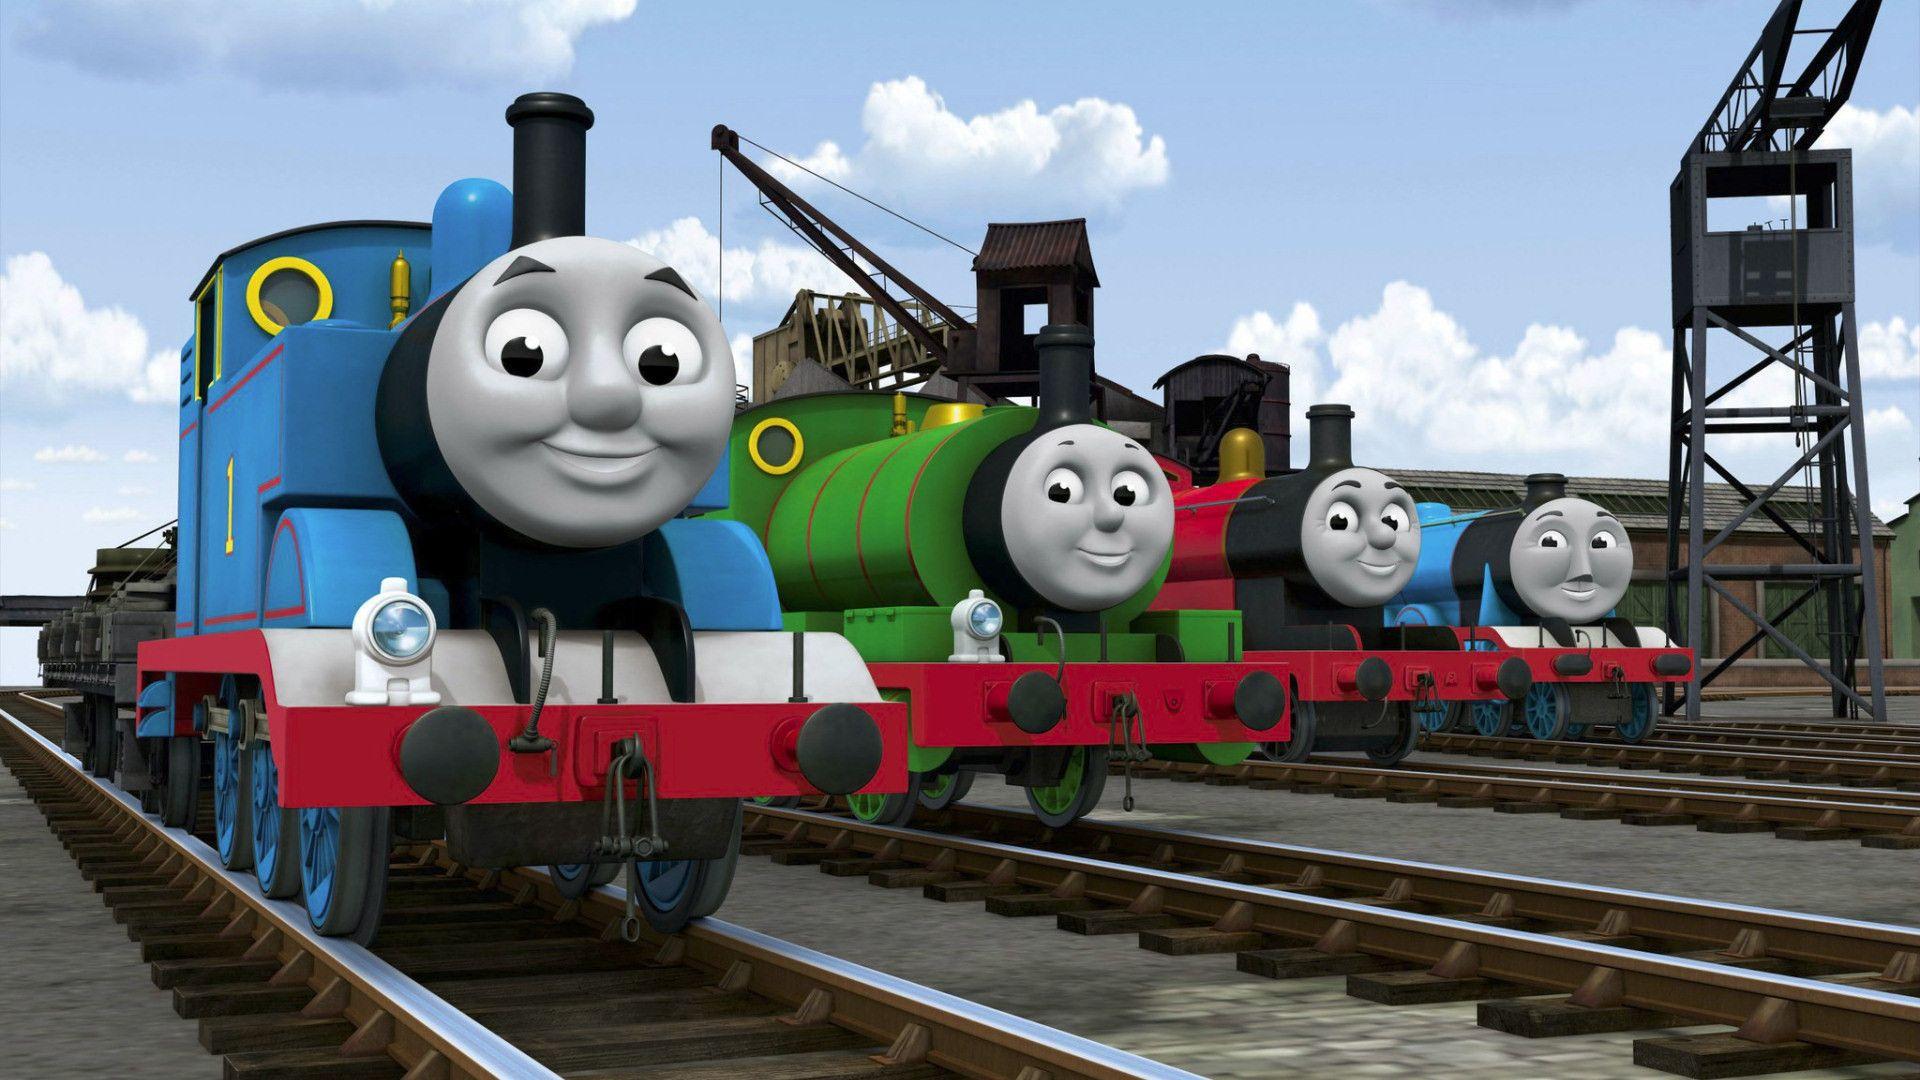 thomas  percy  james  and gordon isaac s 4th birthday thomas the train clip art black and white thomas the train clip art images